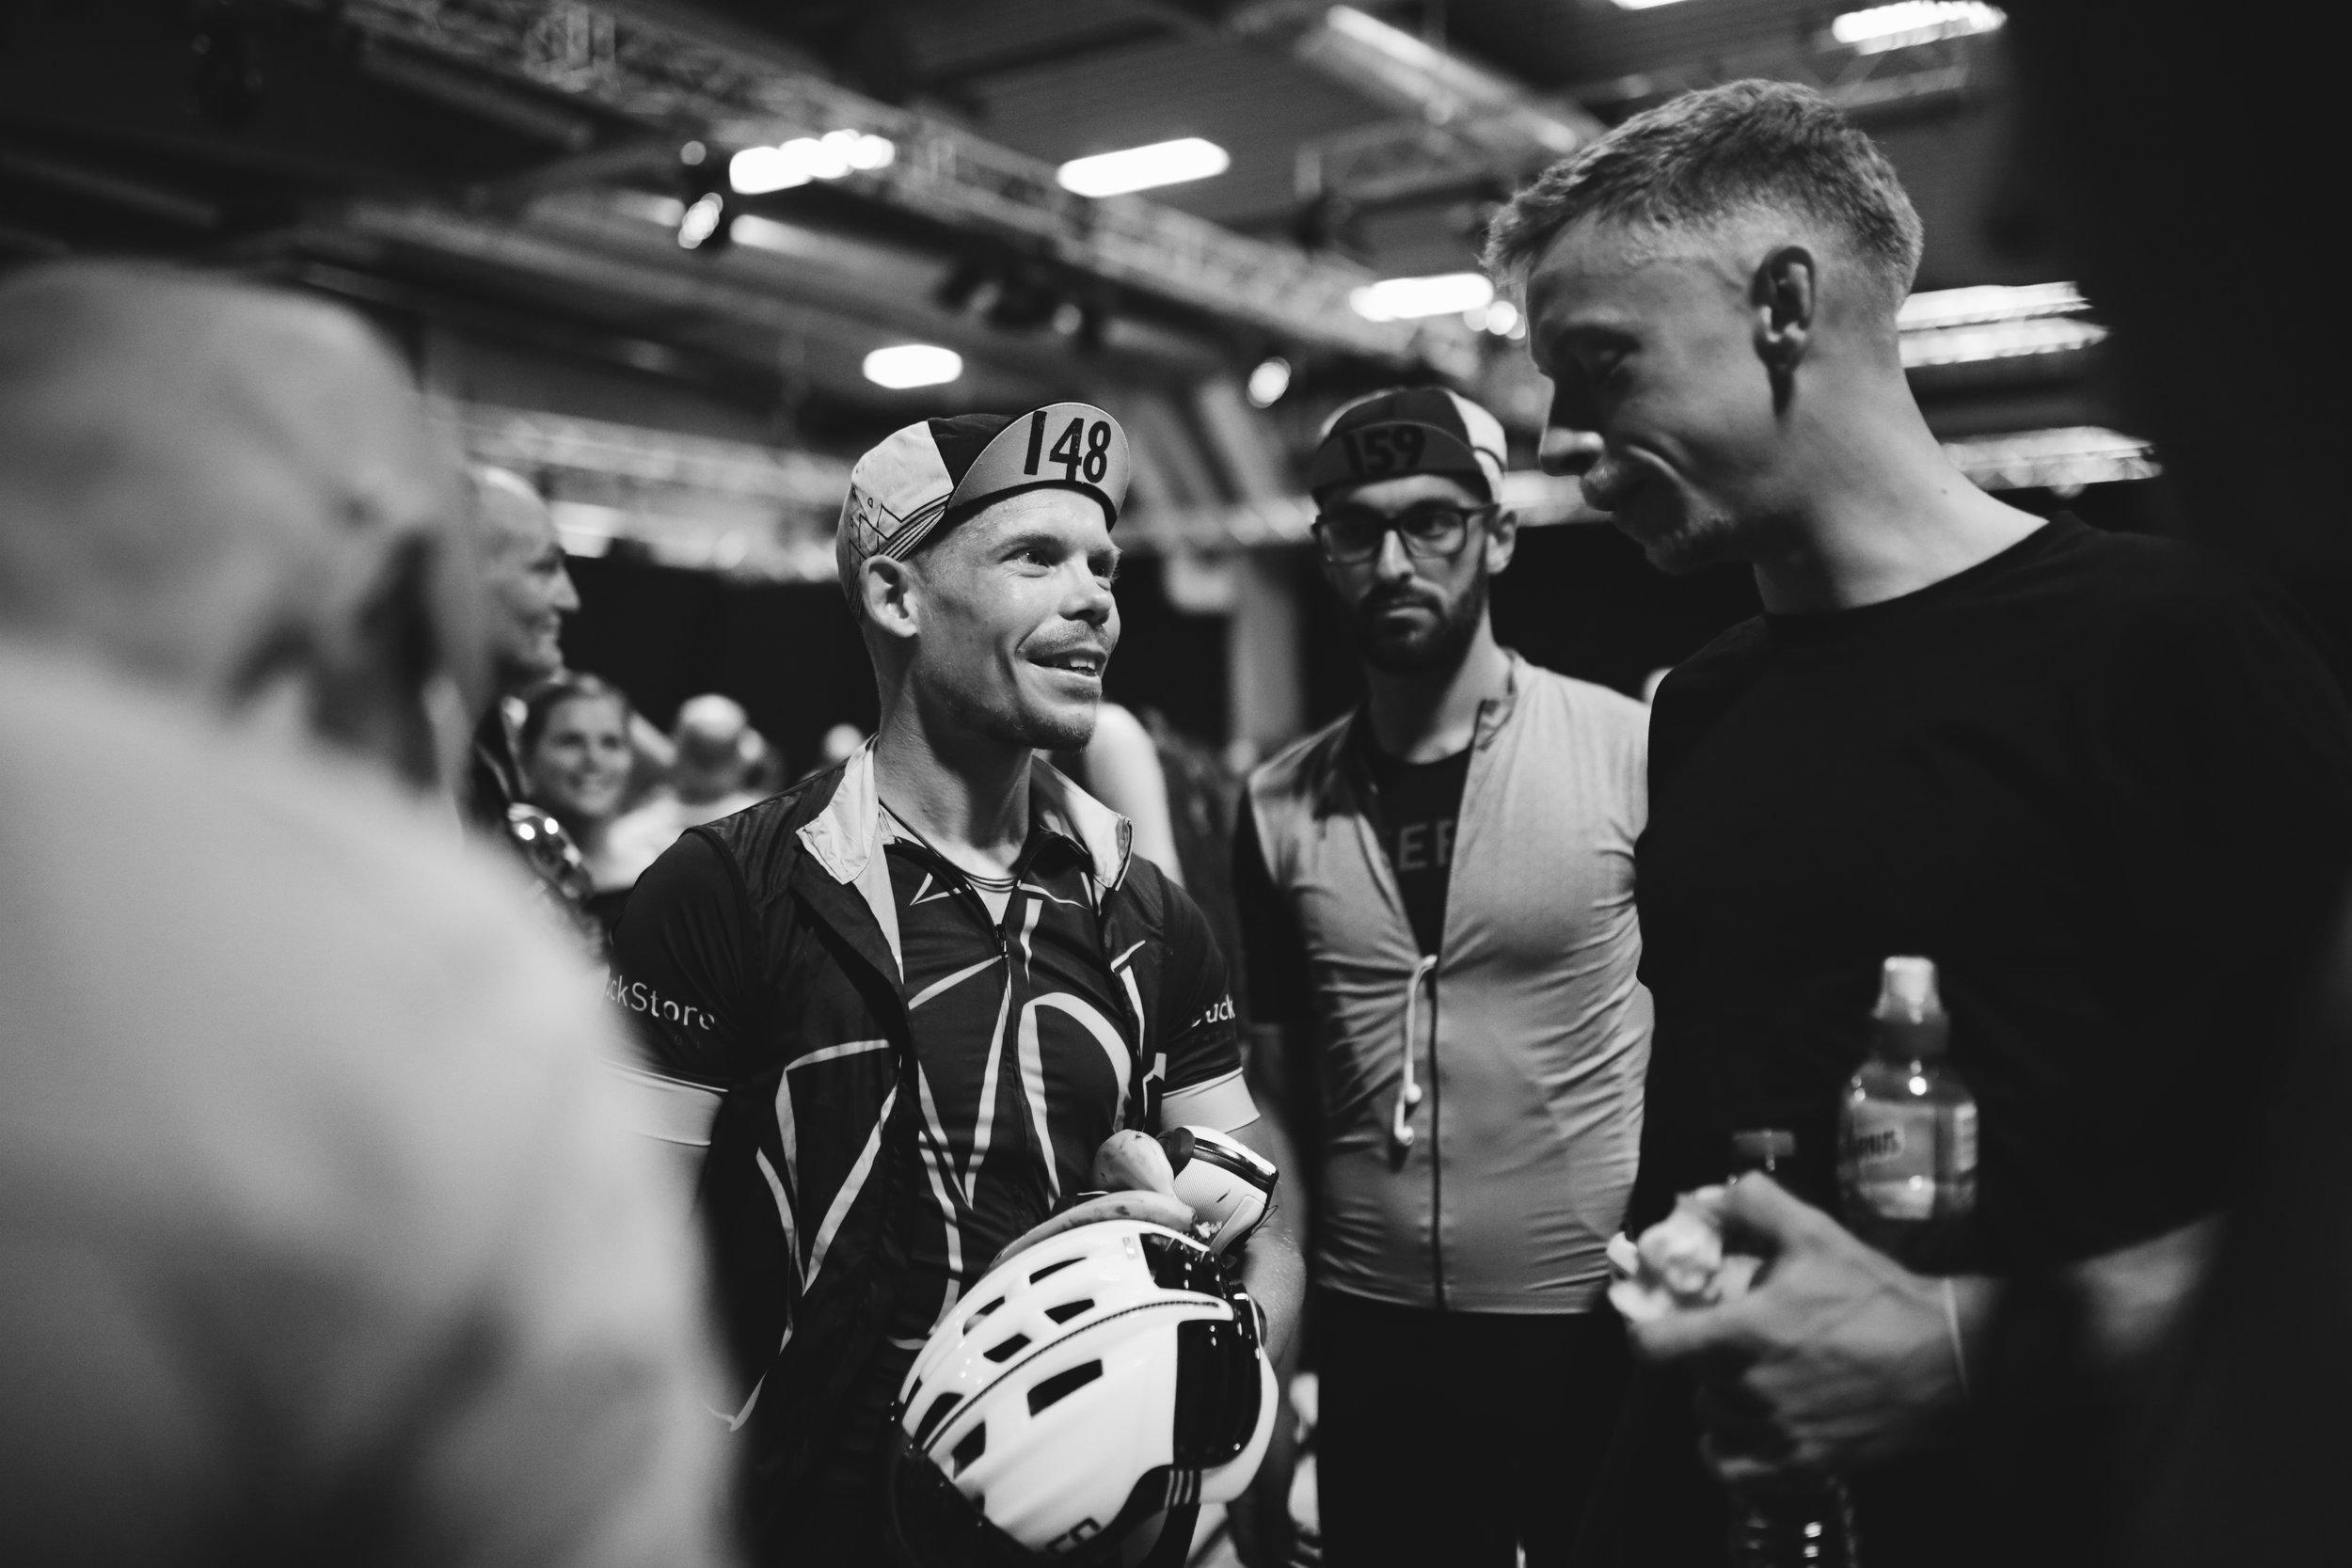 RACE REPORT - Credits: James Robertson